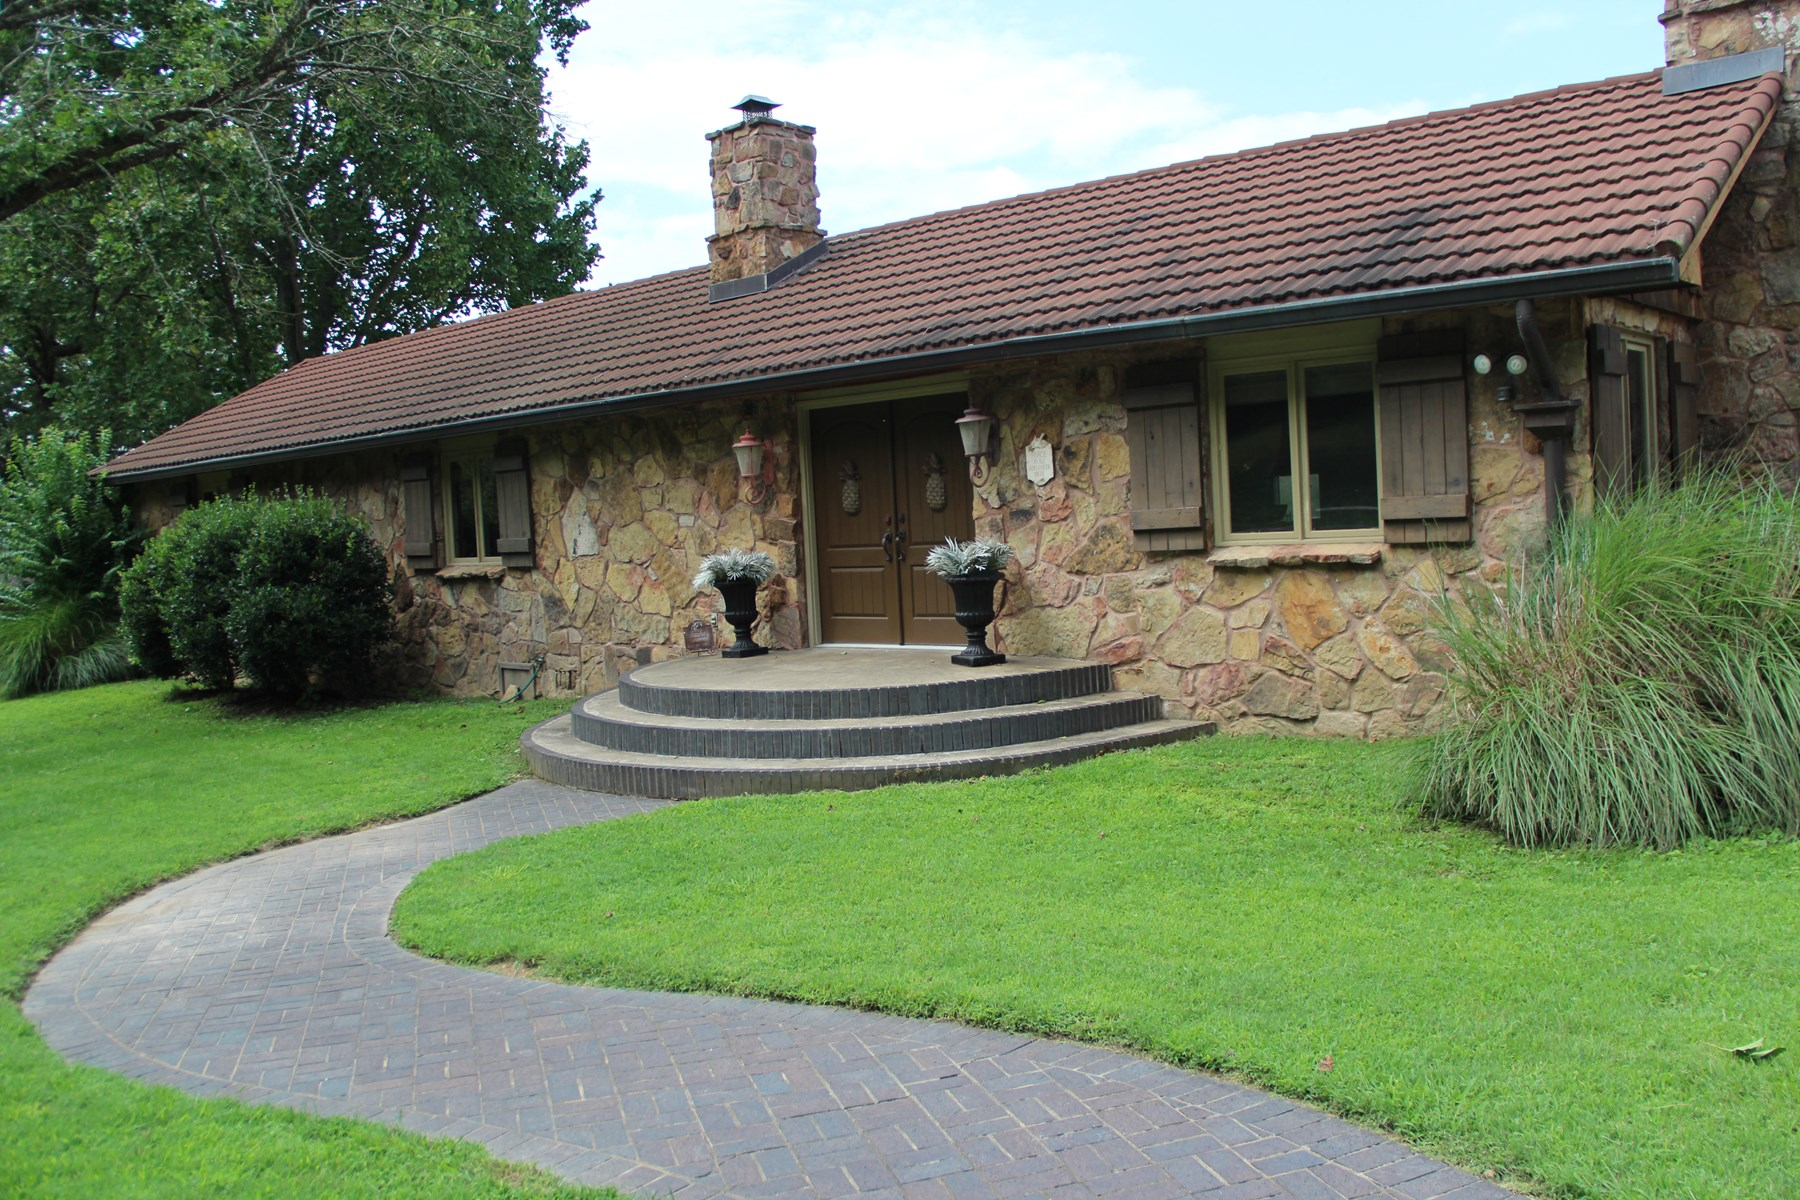 Native stone and lifetime metal shingle roof